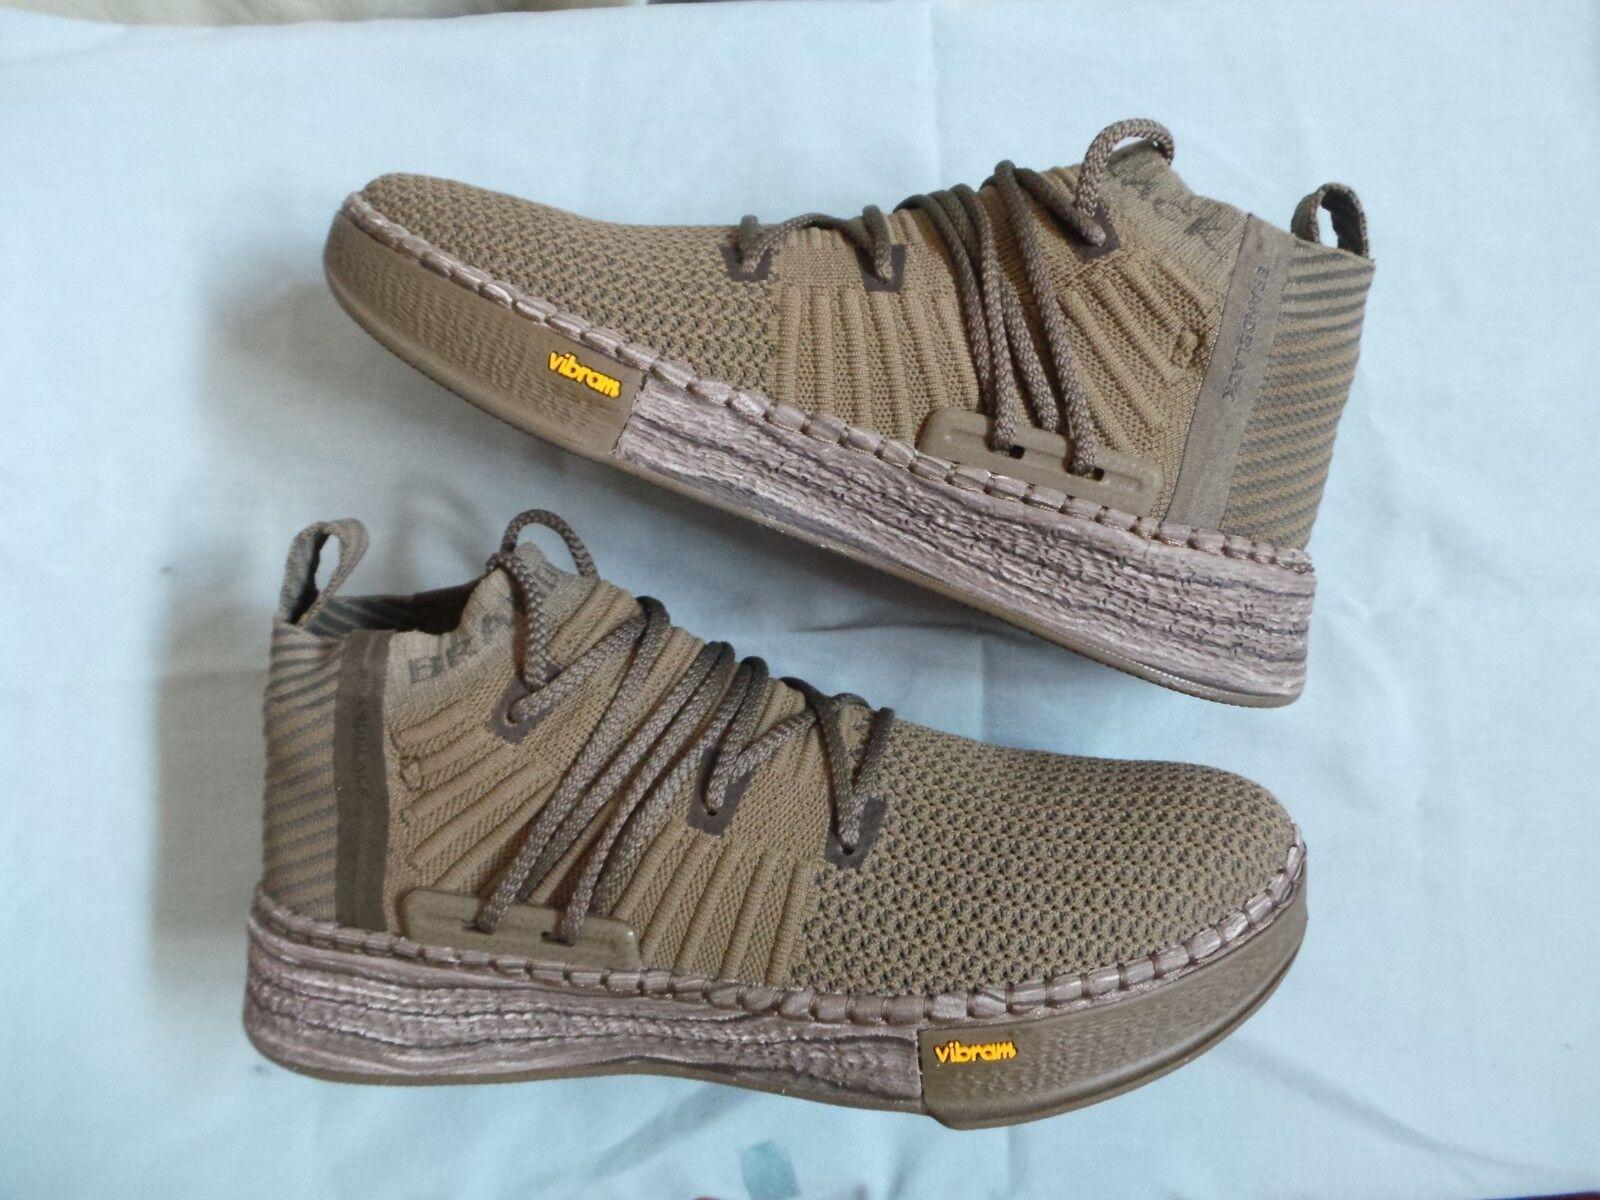 Brandnoir Brand Noir Delta Vibram Basket Chaussure Tricot Sz 11 DS NEUF NEW IN BOX 140